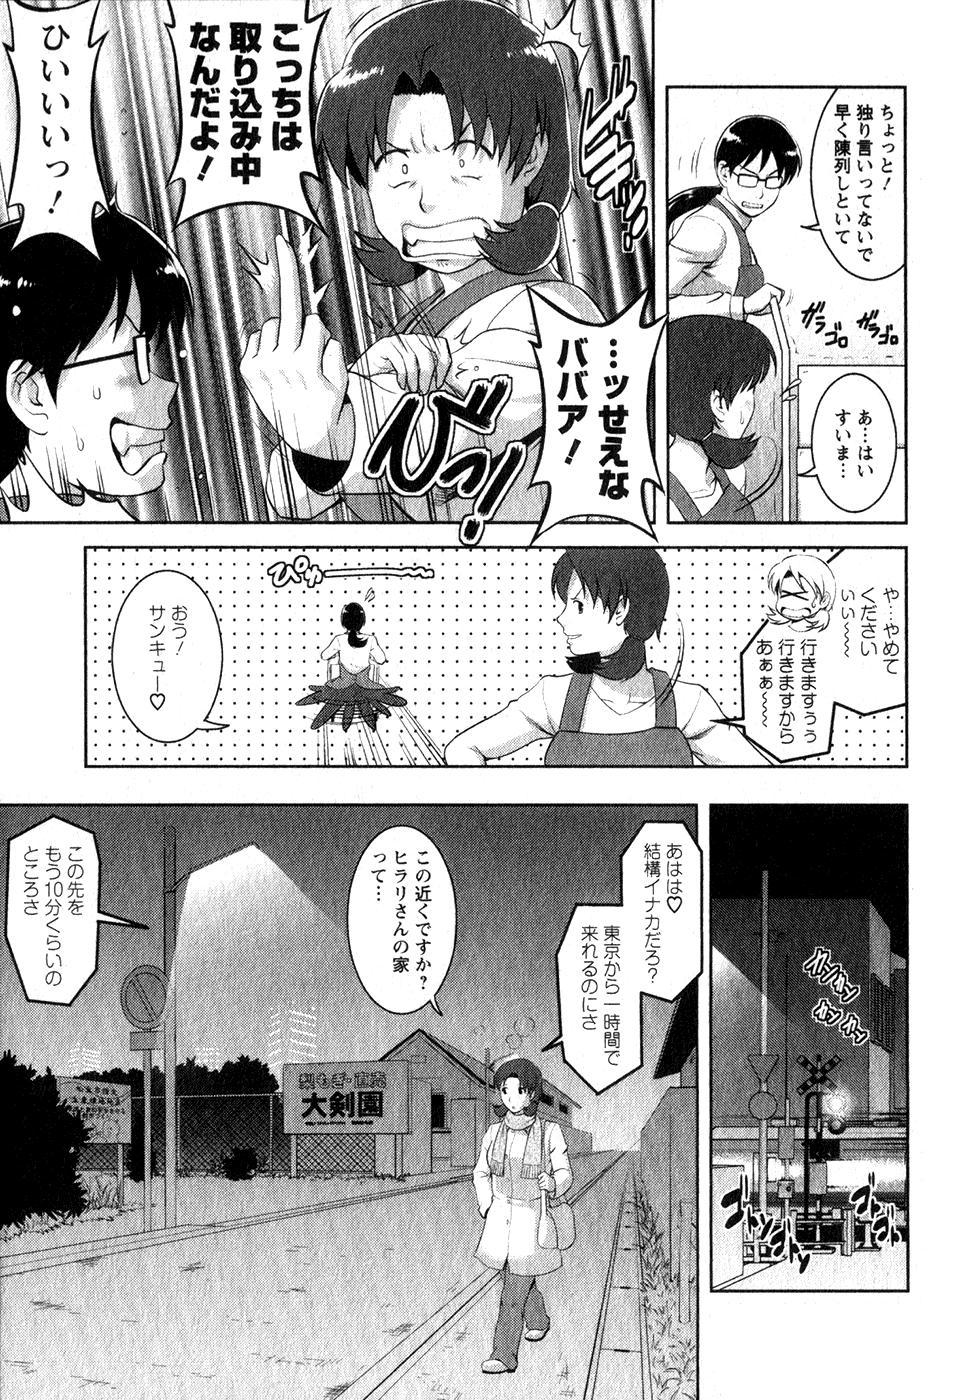 [Saigado] Kururi-san to Hirari-san Vol. 1 (Complete) 109